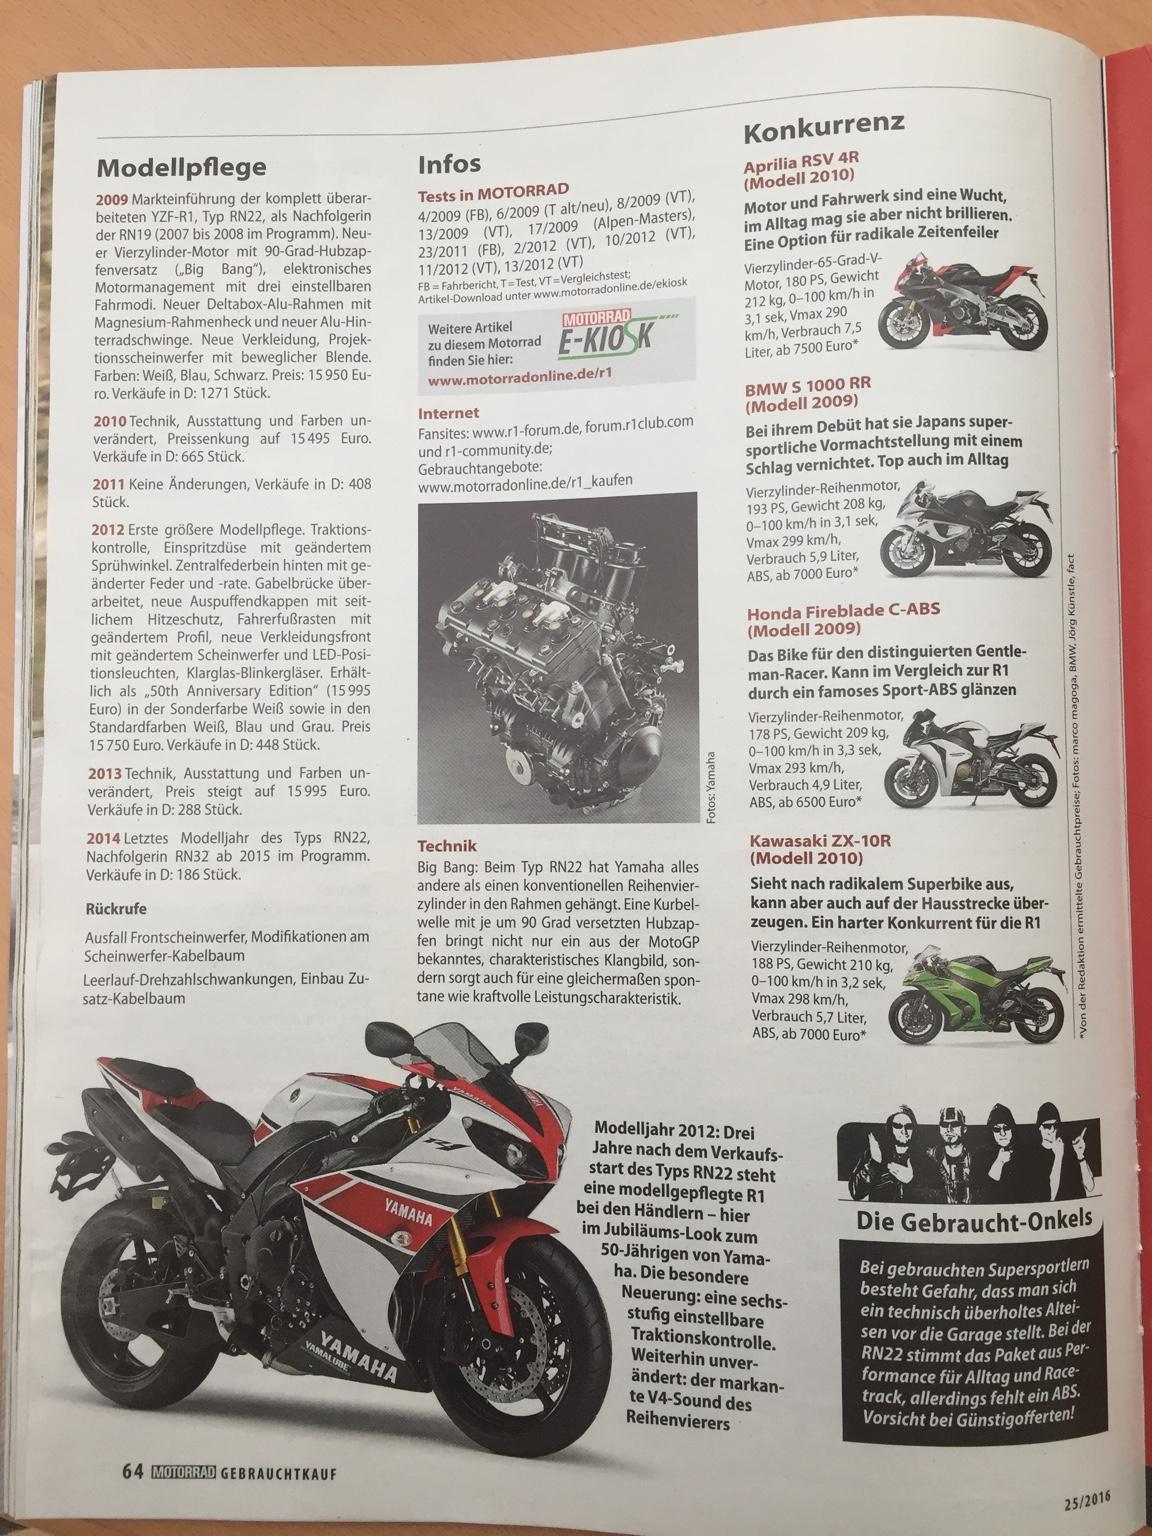 Ziemlich 2007 Yamaha R1 Rahmen Ideen - Rahmen Ideen ...